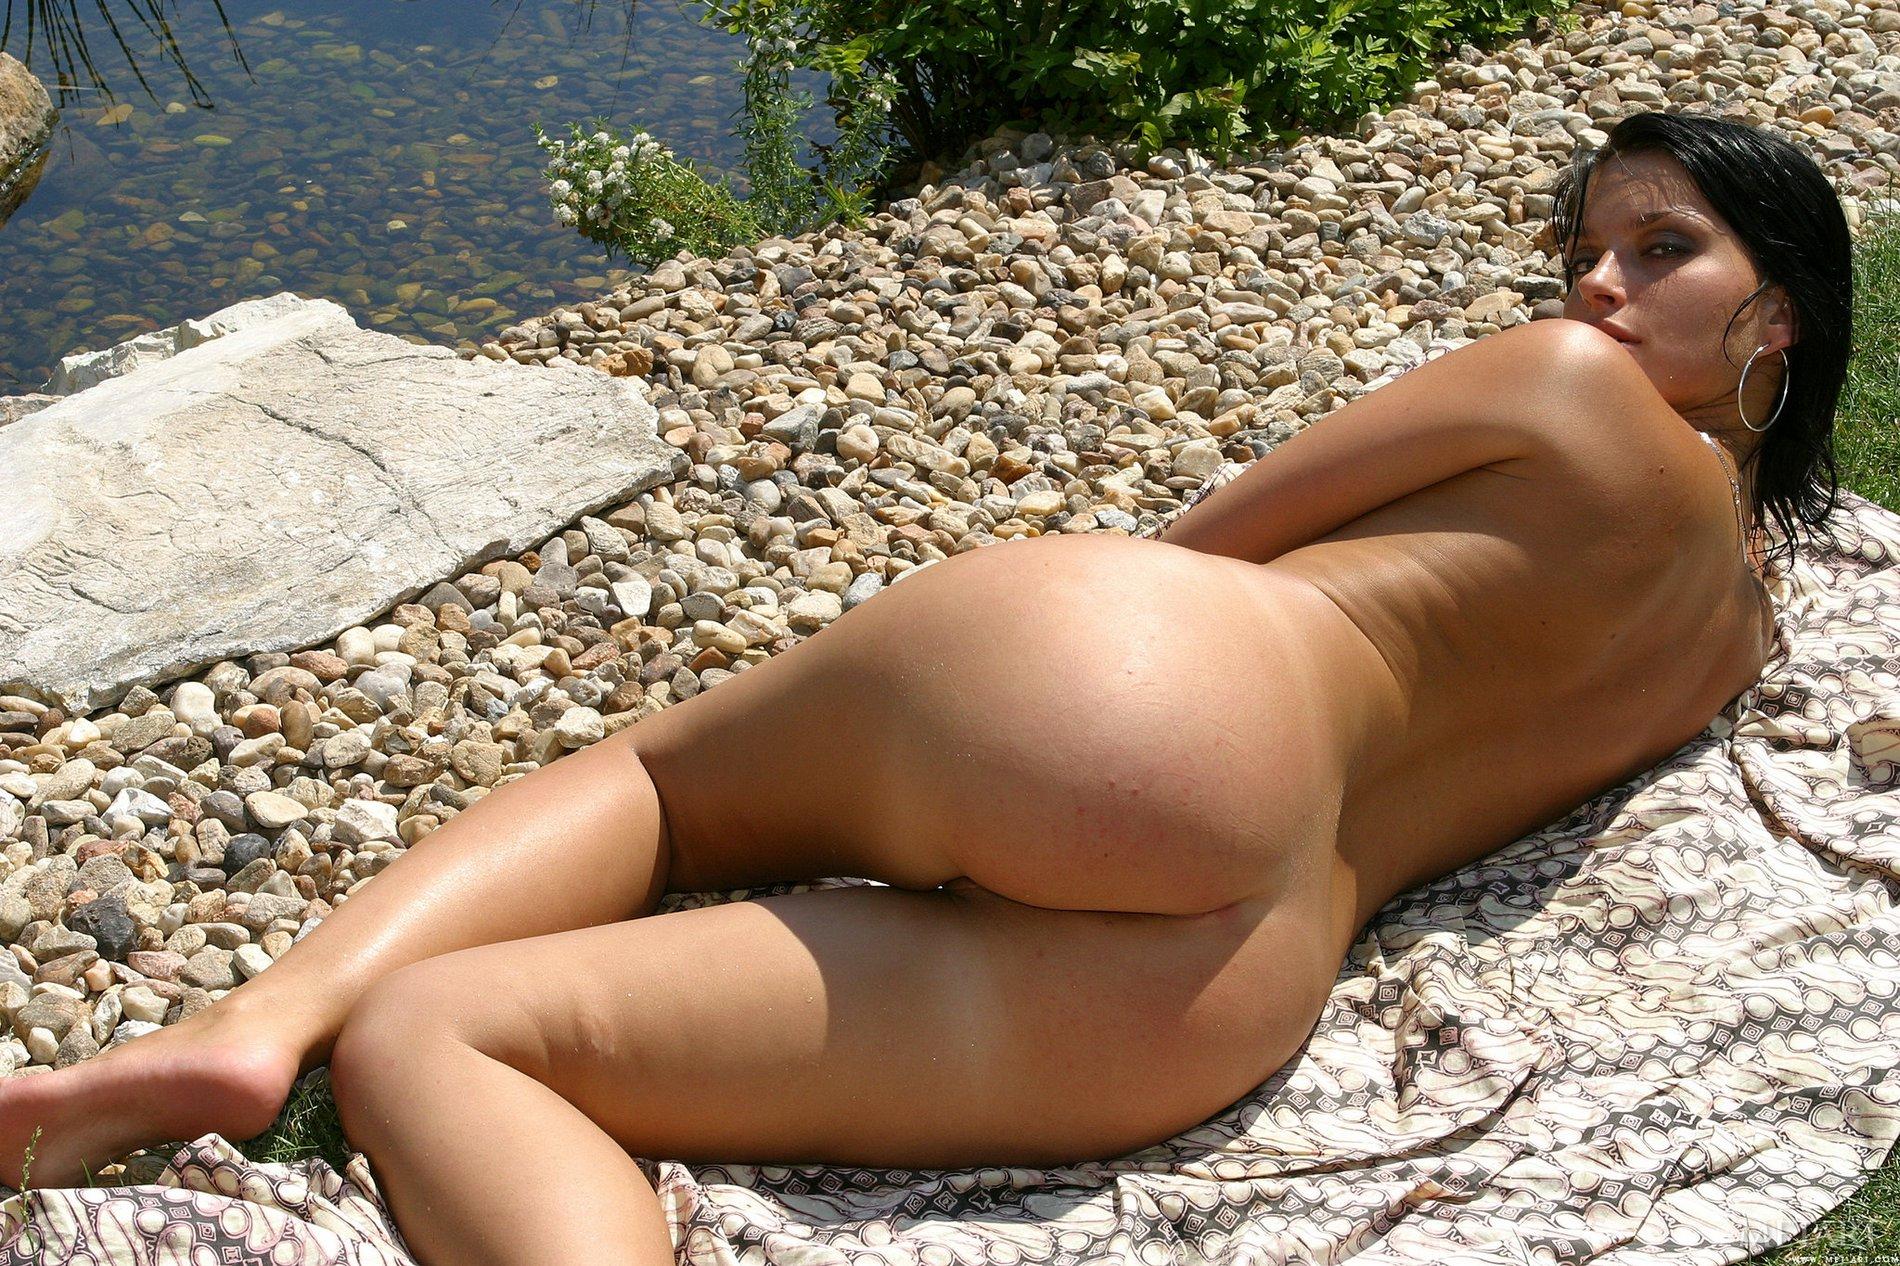 marketa brymova nude